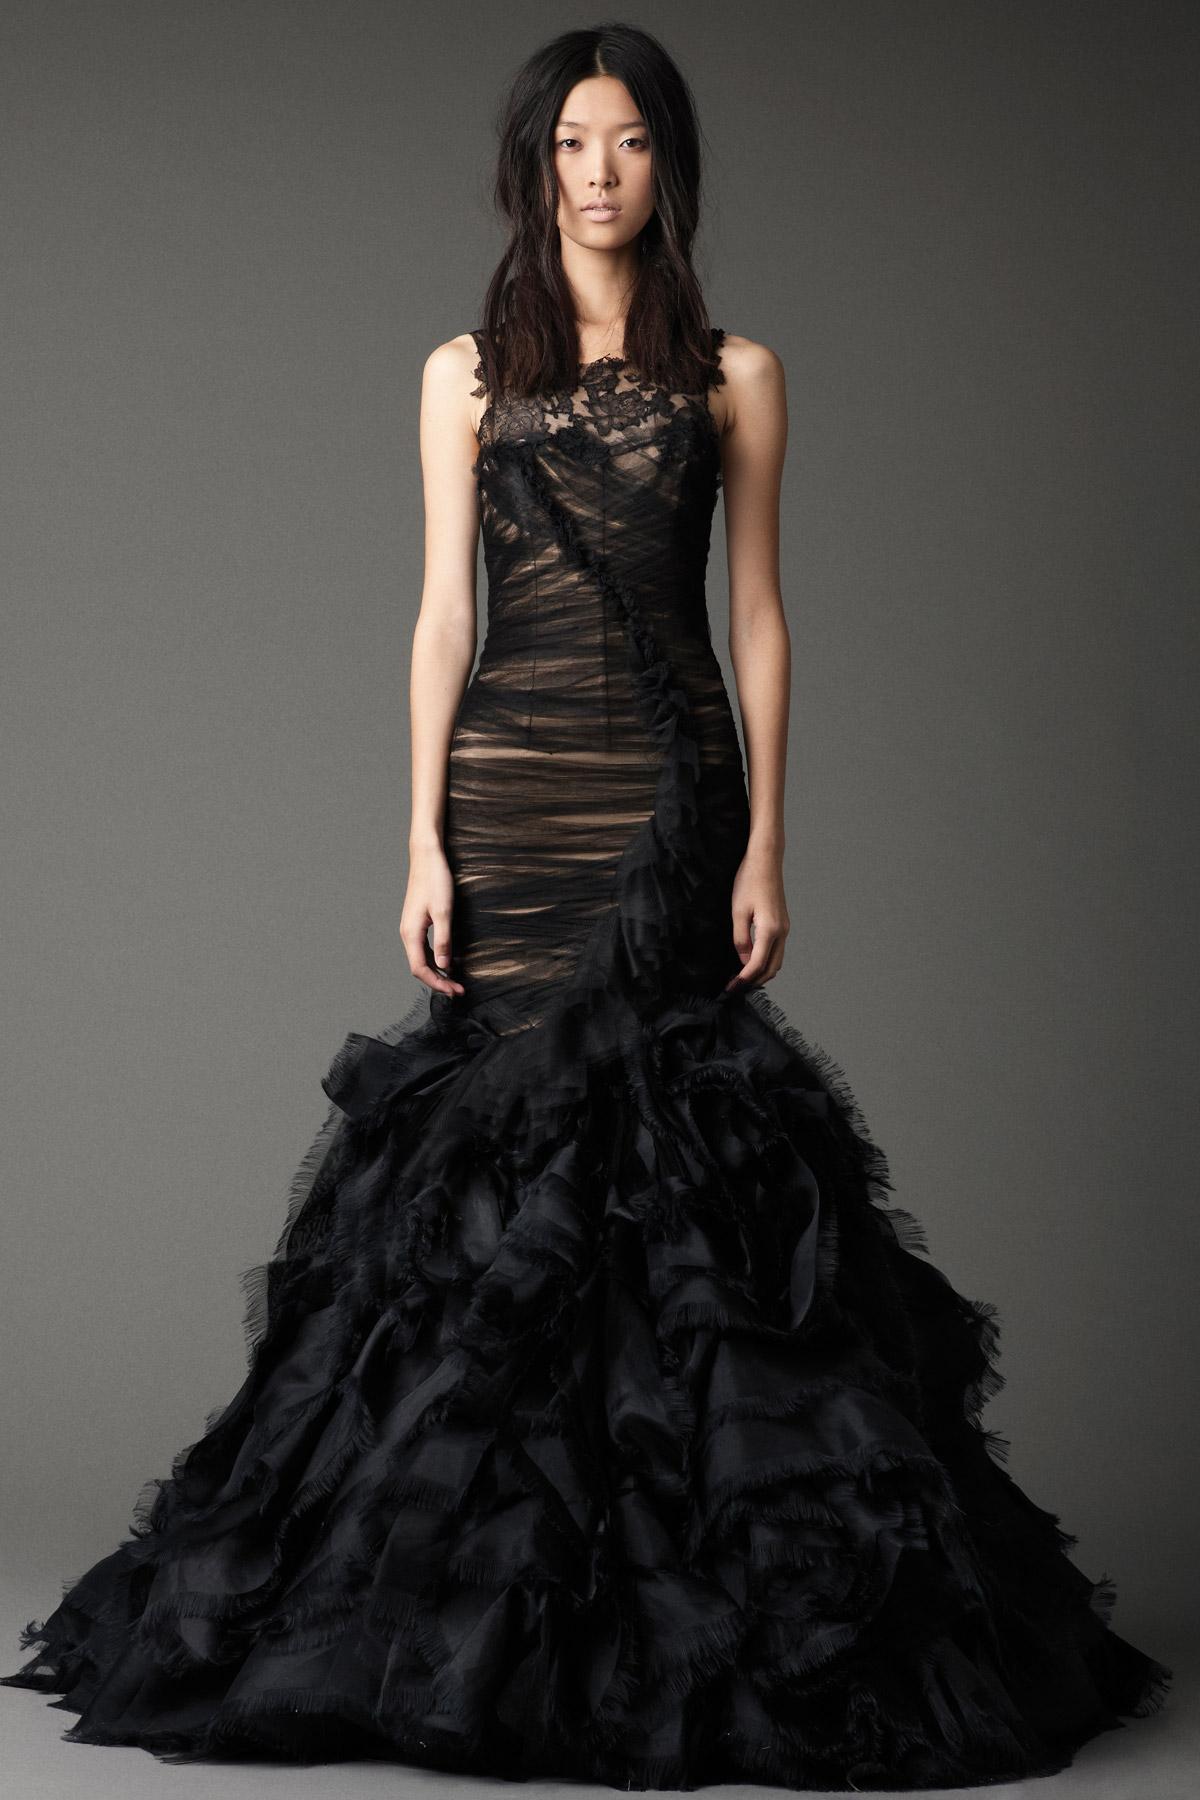 Vera Wang Fall Winter 2012 Bridal Collection | The FashionBrides